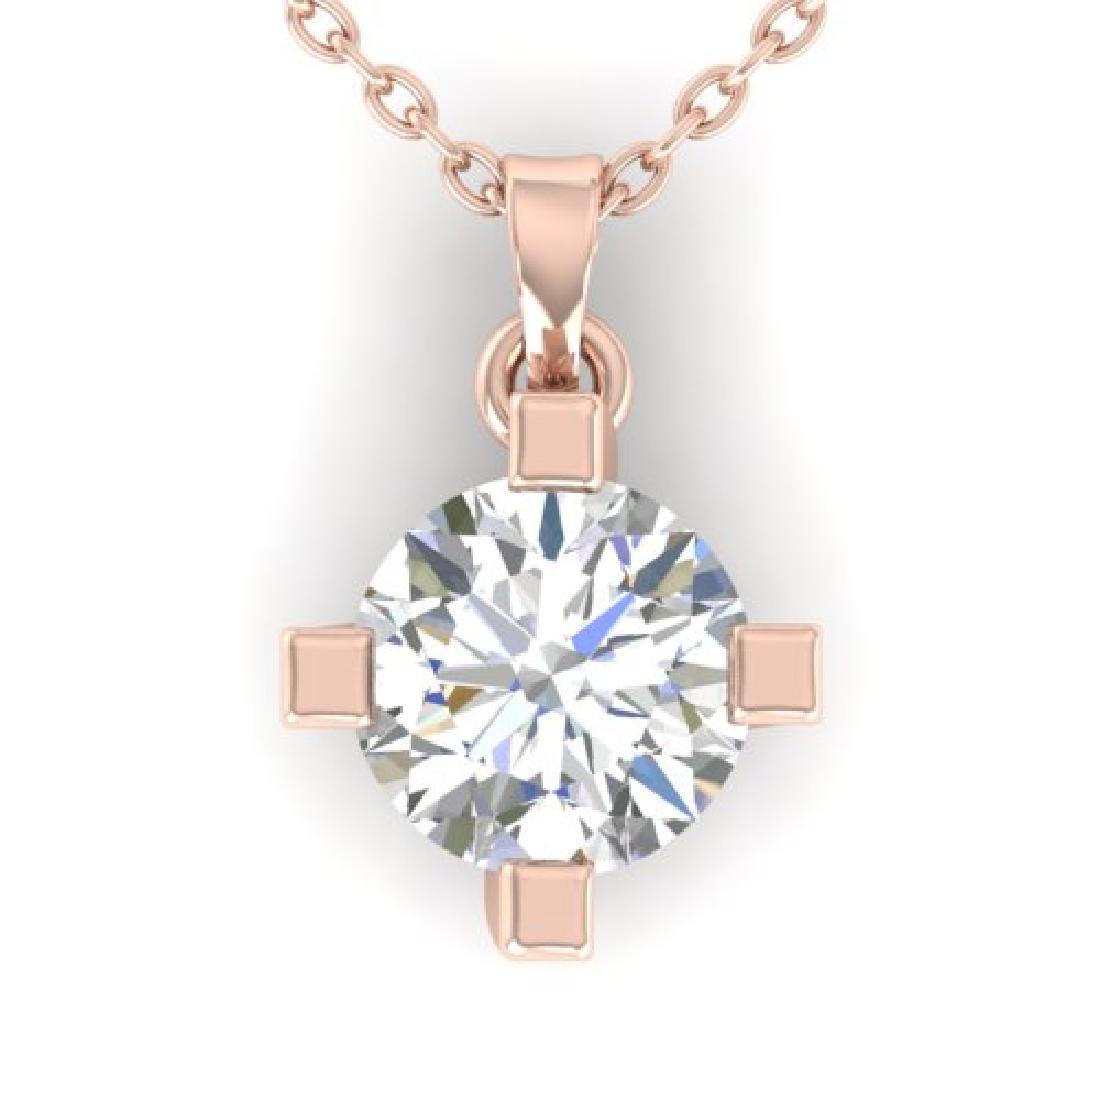 1 CTW Certified VS/SI Diamond Solitaire Necklace 14K